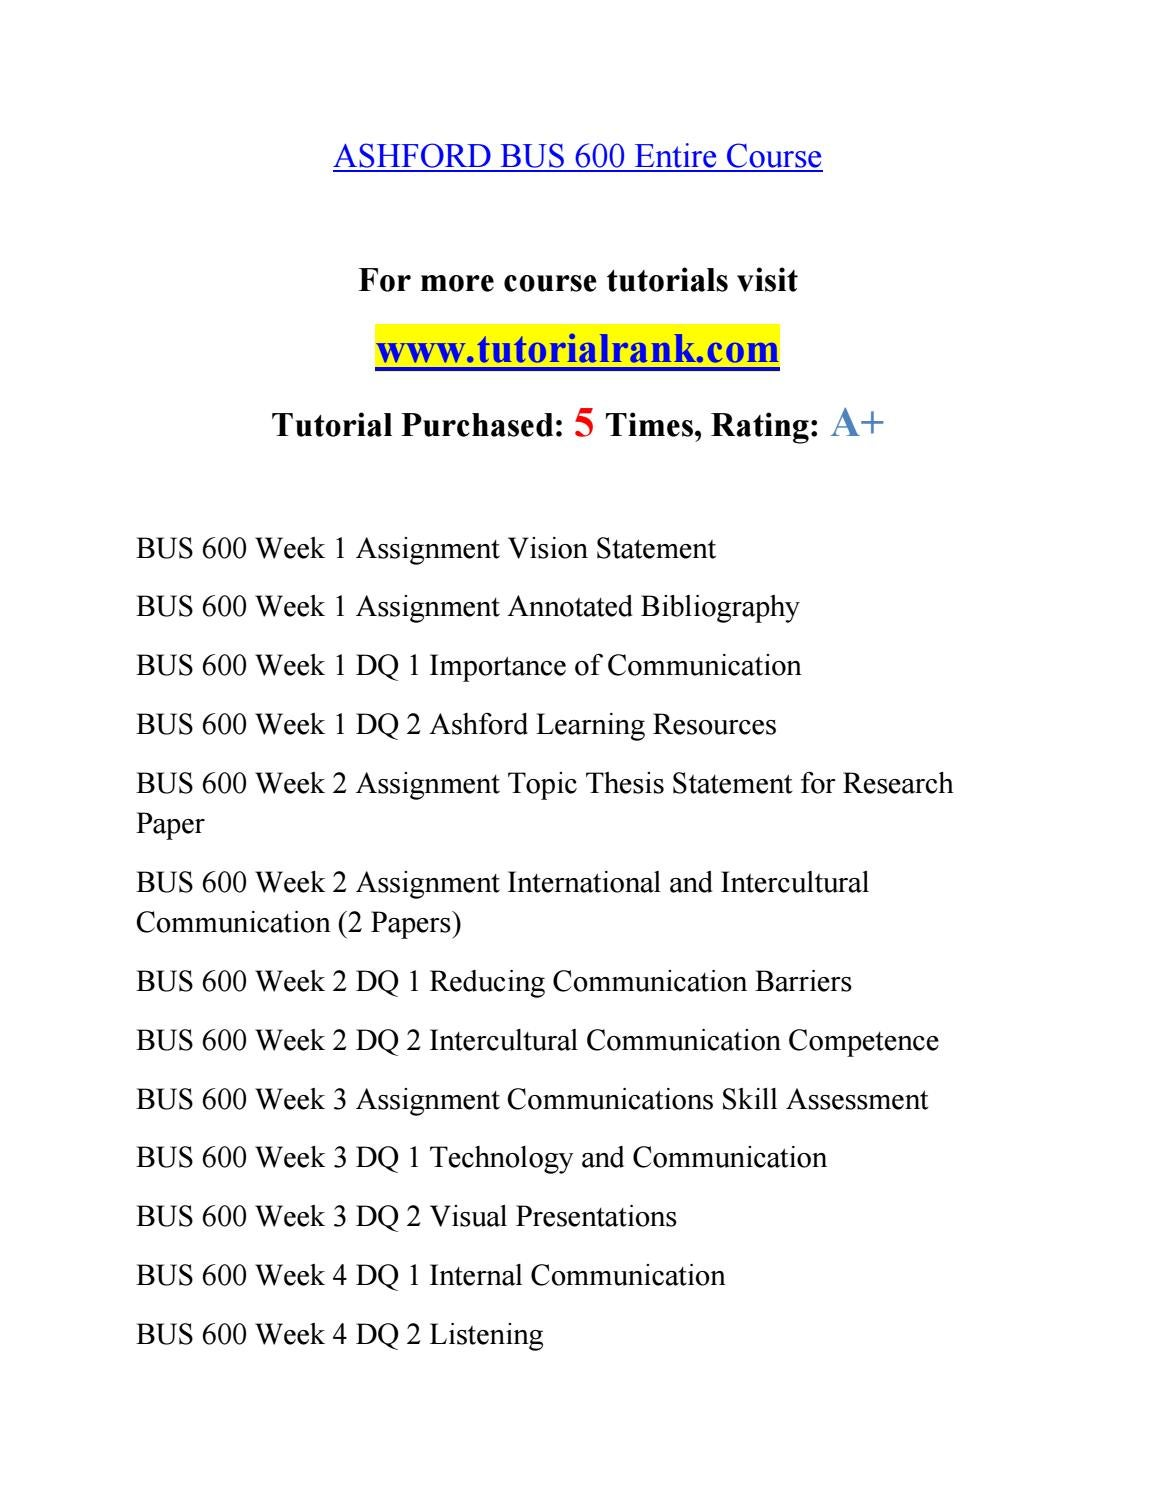 Thesis internal communication custom dissertation results ghostwriters website online